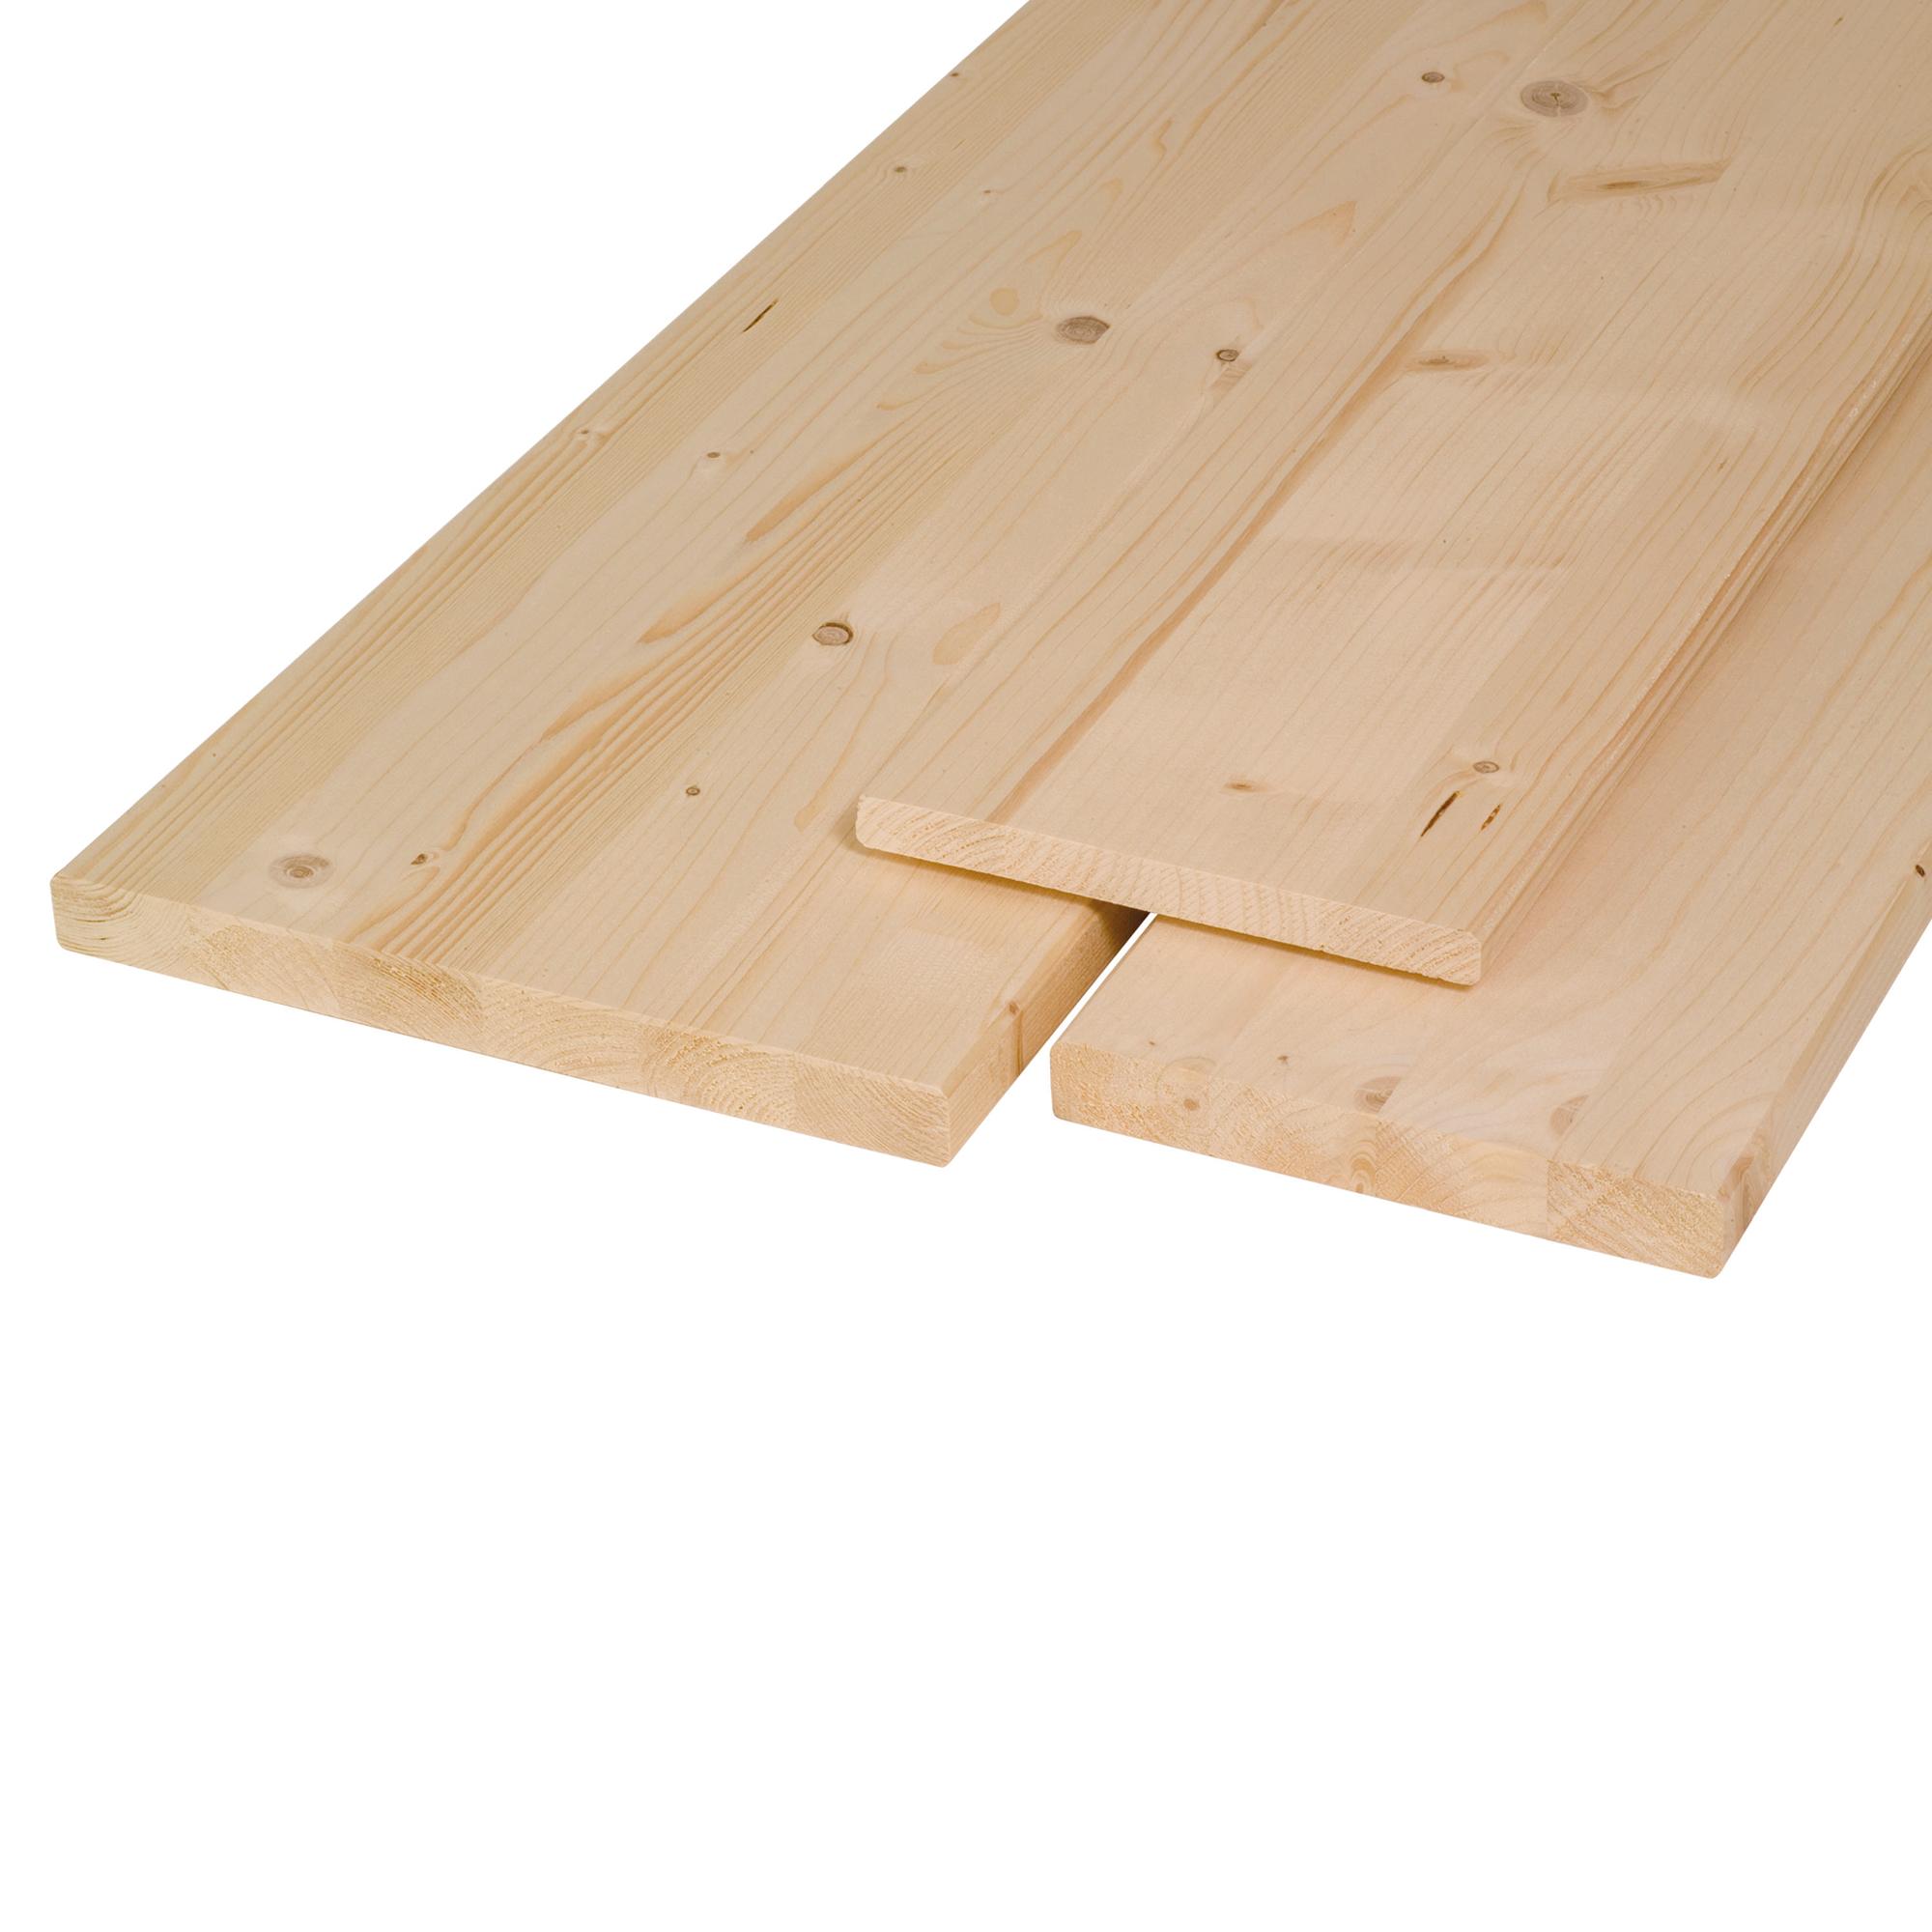 Klenk Holz 003983 Fichte//Tanne 34x54x2.000mm Rahmen gehobelt 8 St/ück